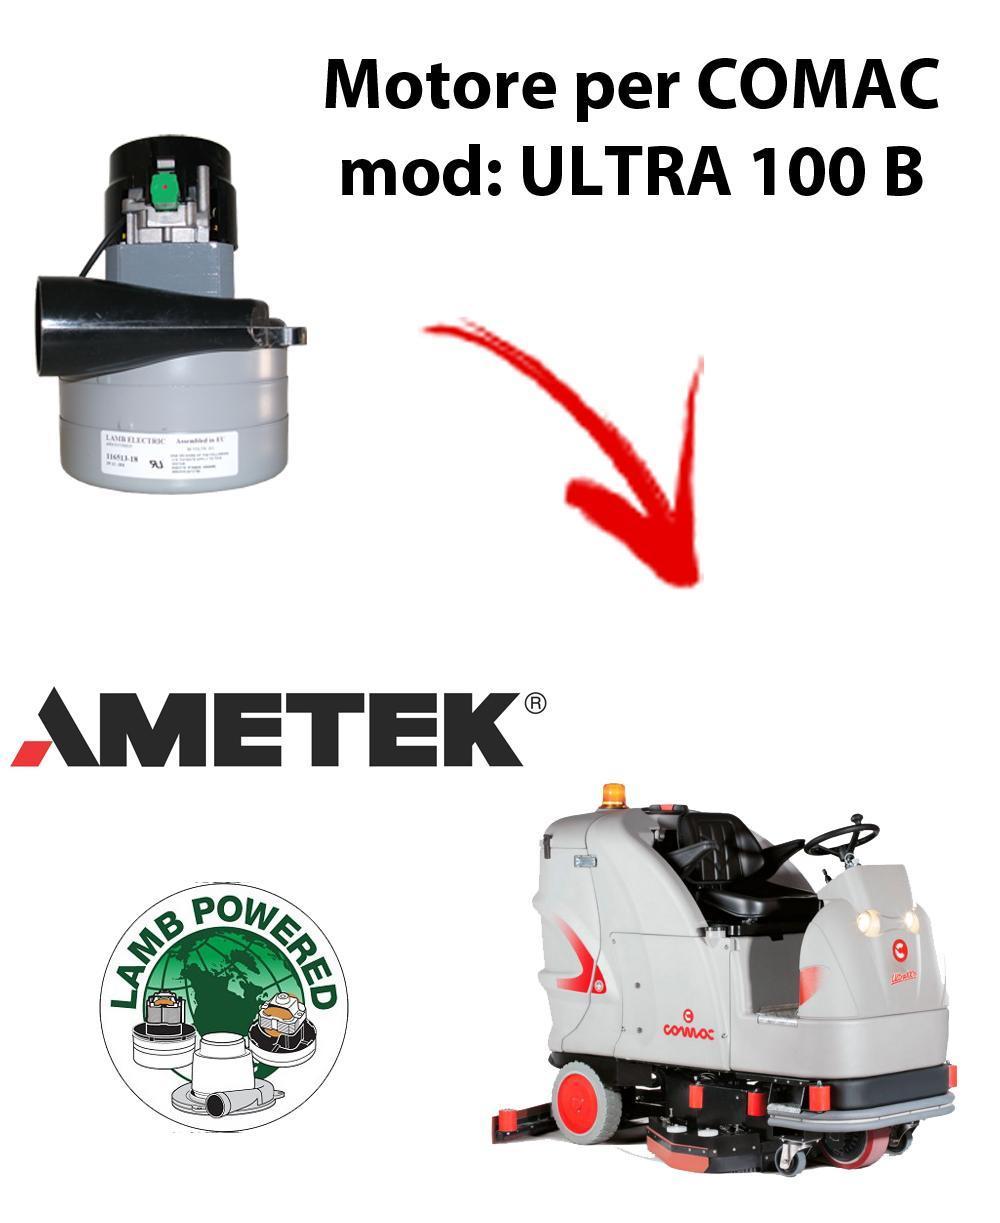 ULTRA 100 B Saugmotor AMETEK für scheuersaugmaschinen COMAC